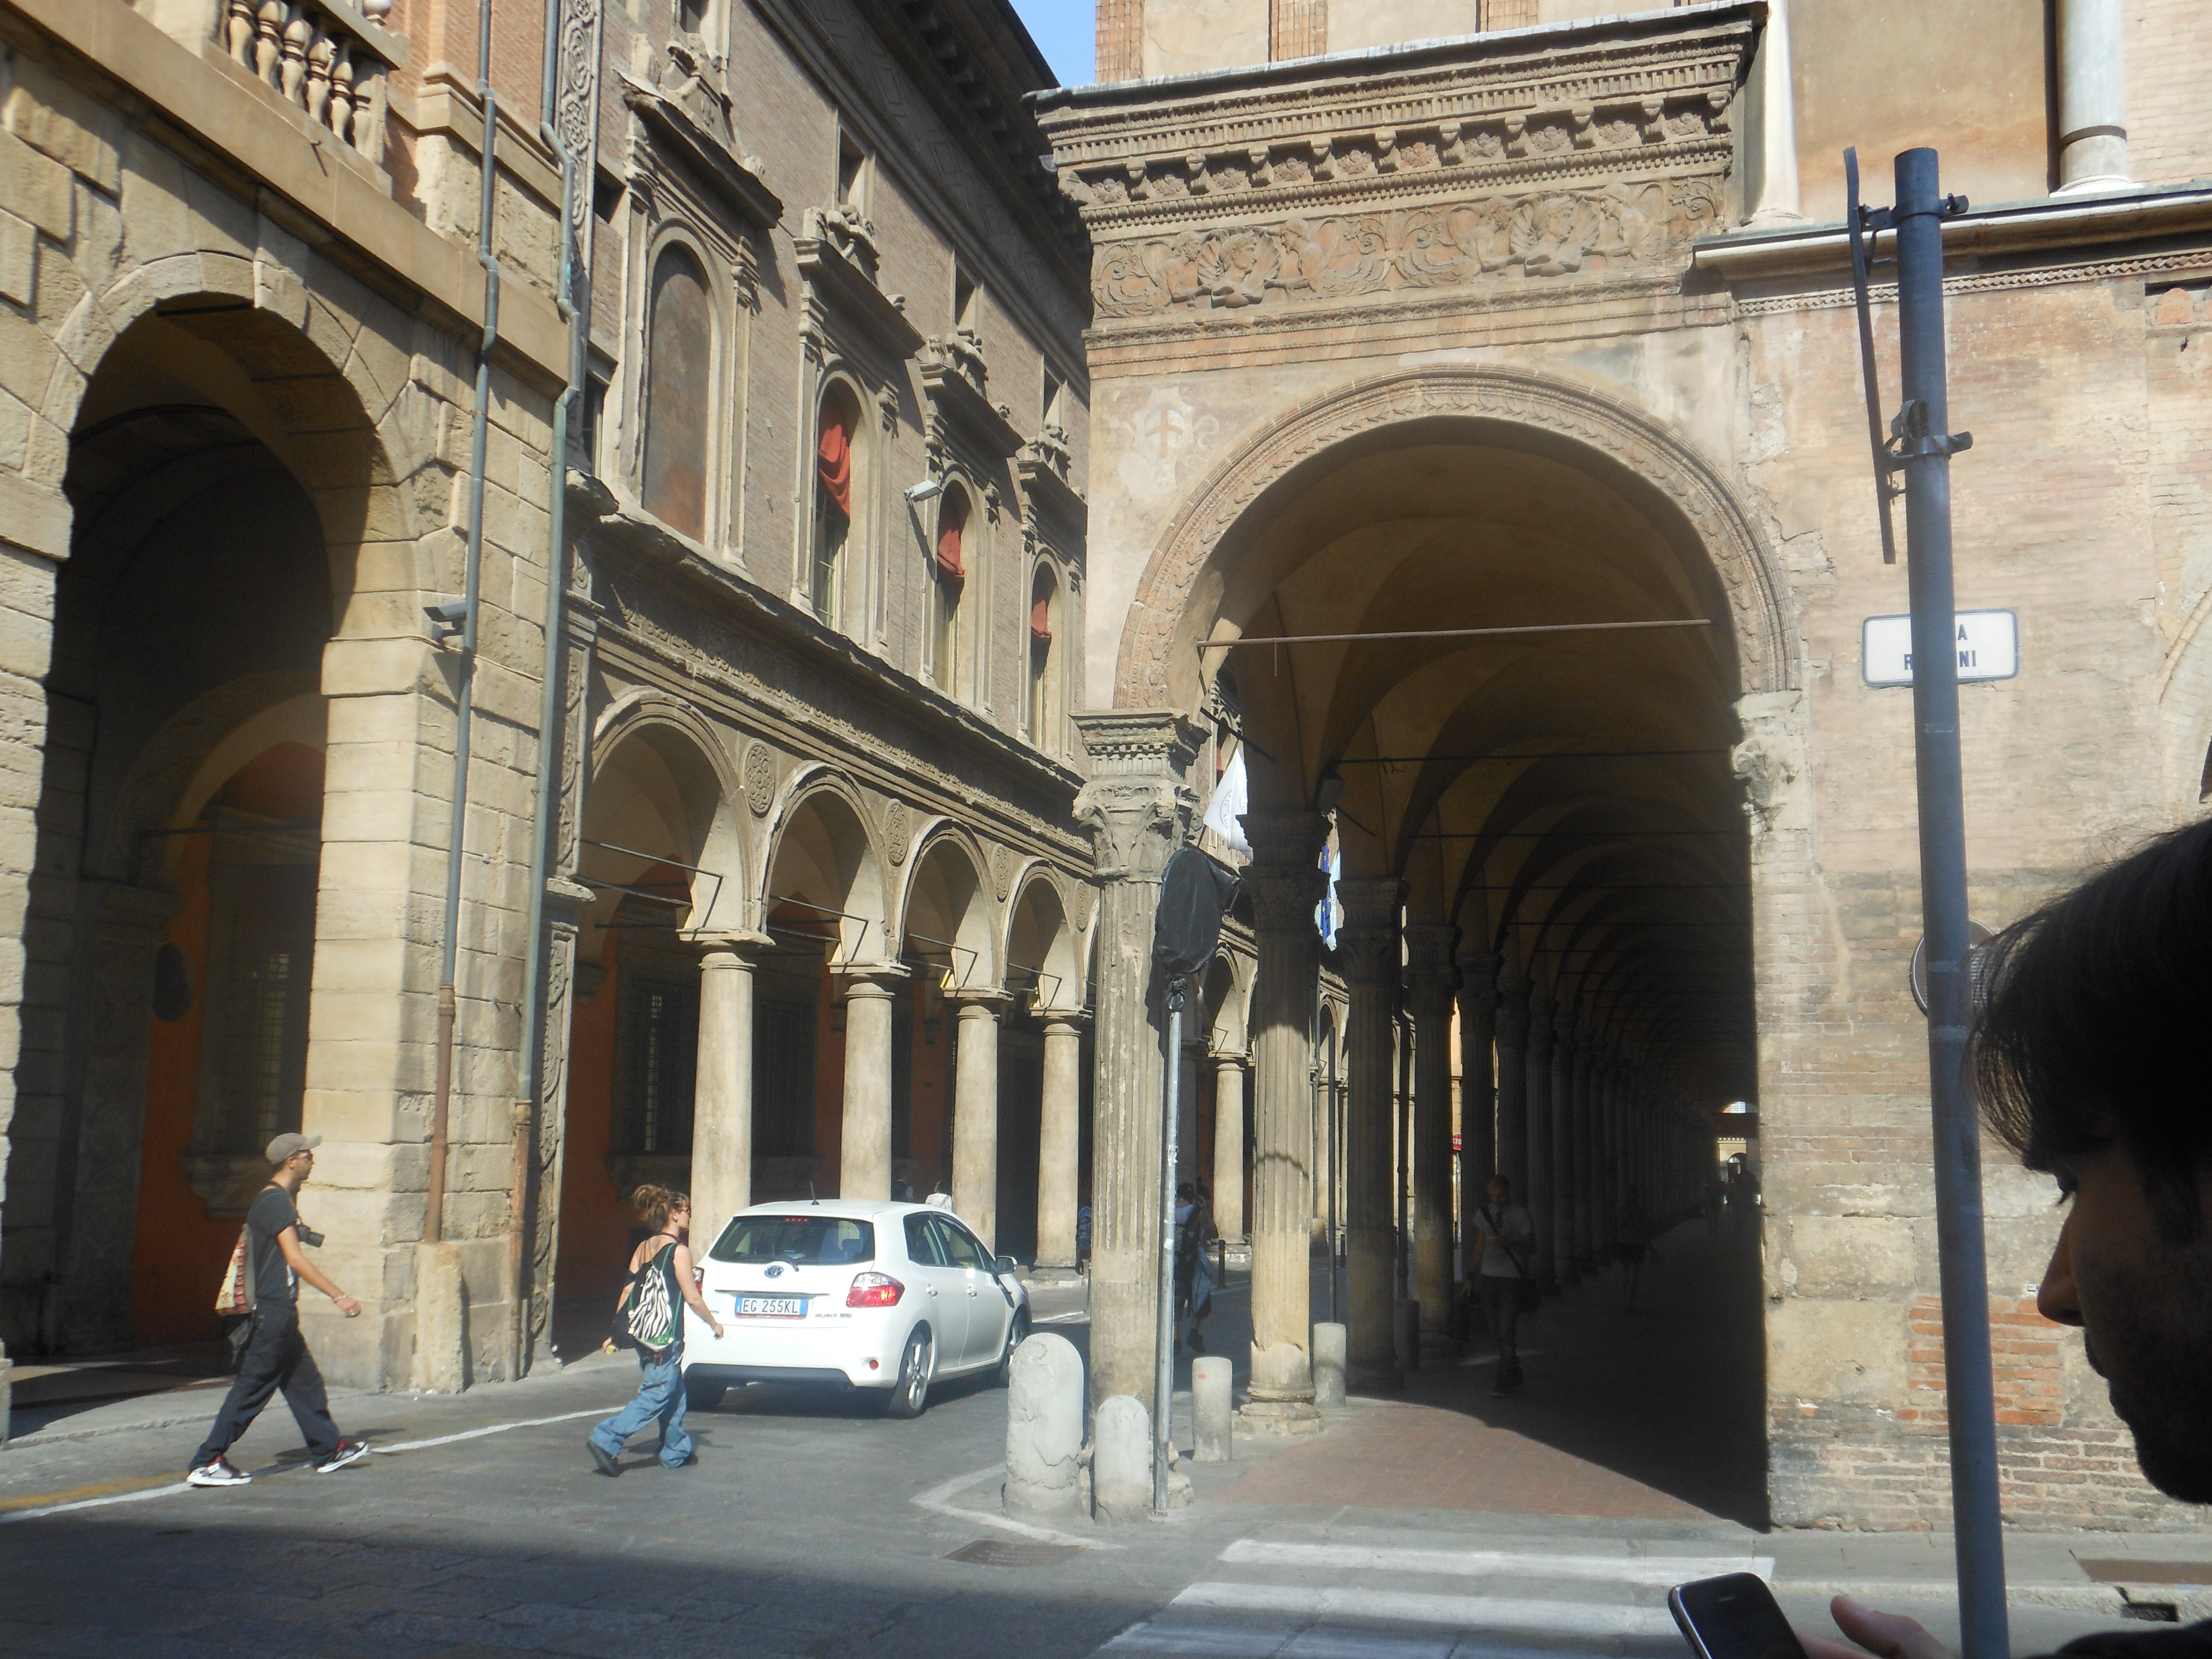 https://upload.wikimedia.org/wikipedia/commons/6/6e/Portico_di_San_Giacomo%2C_Bologna.JPG